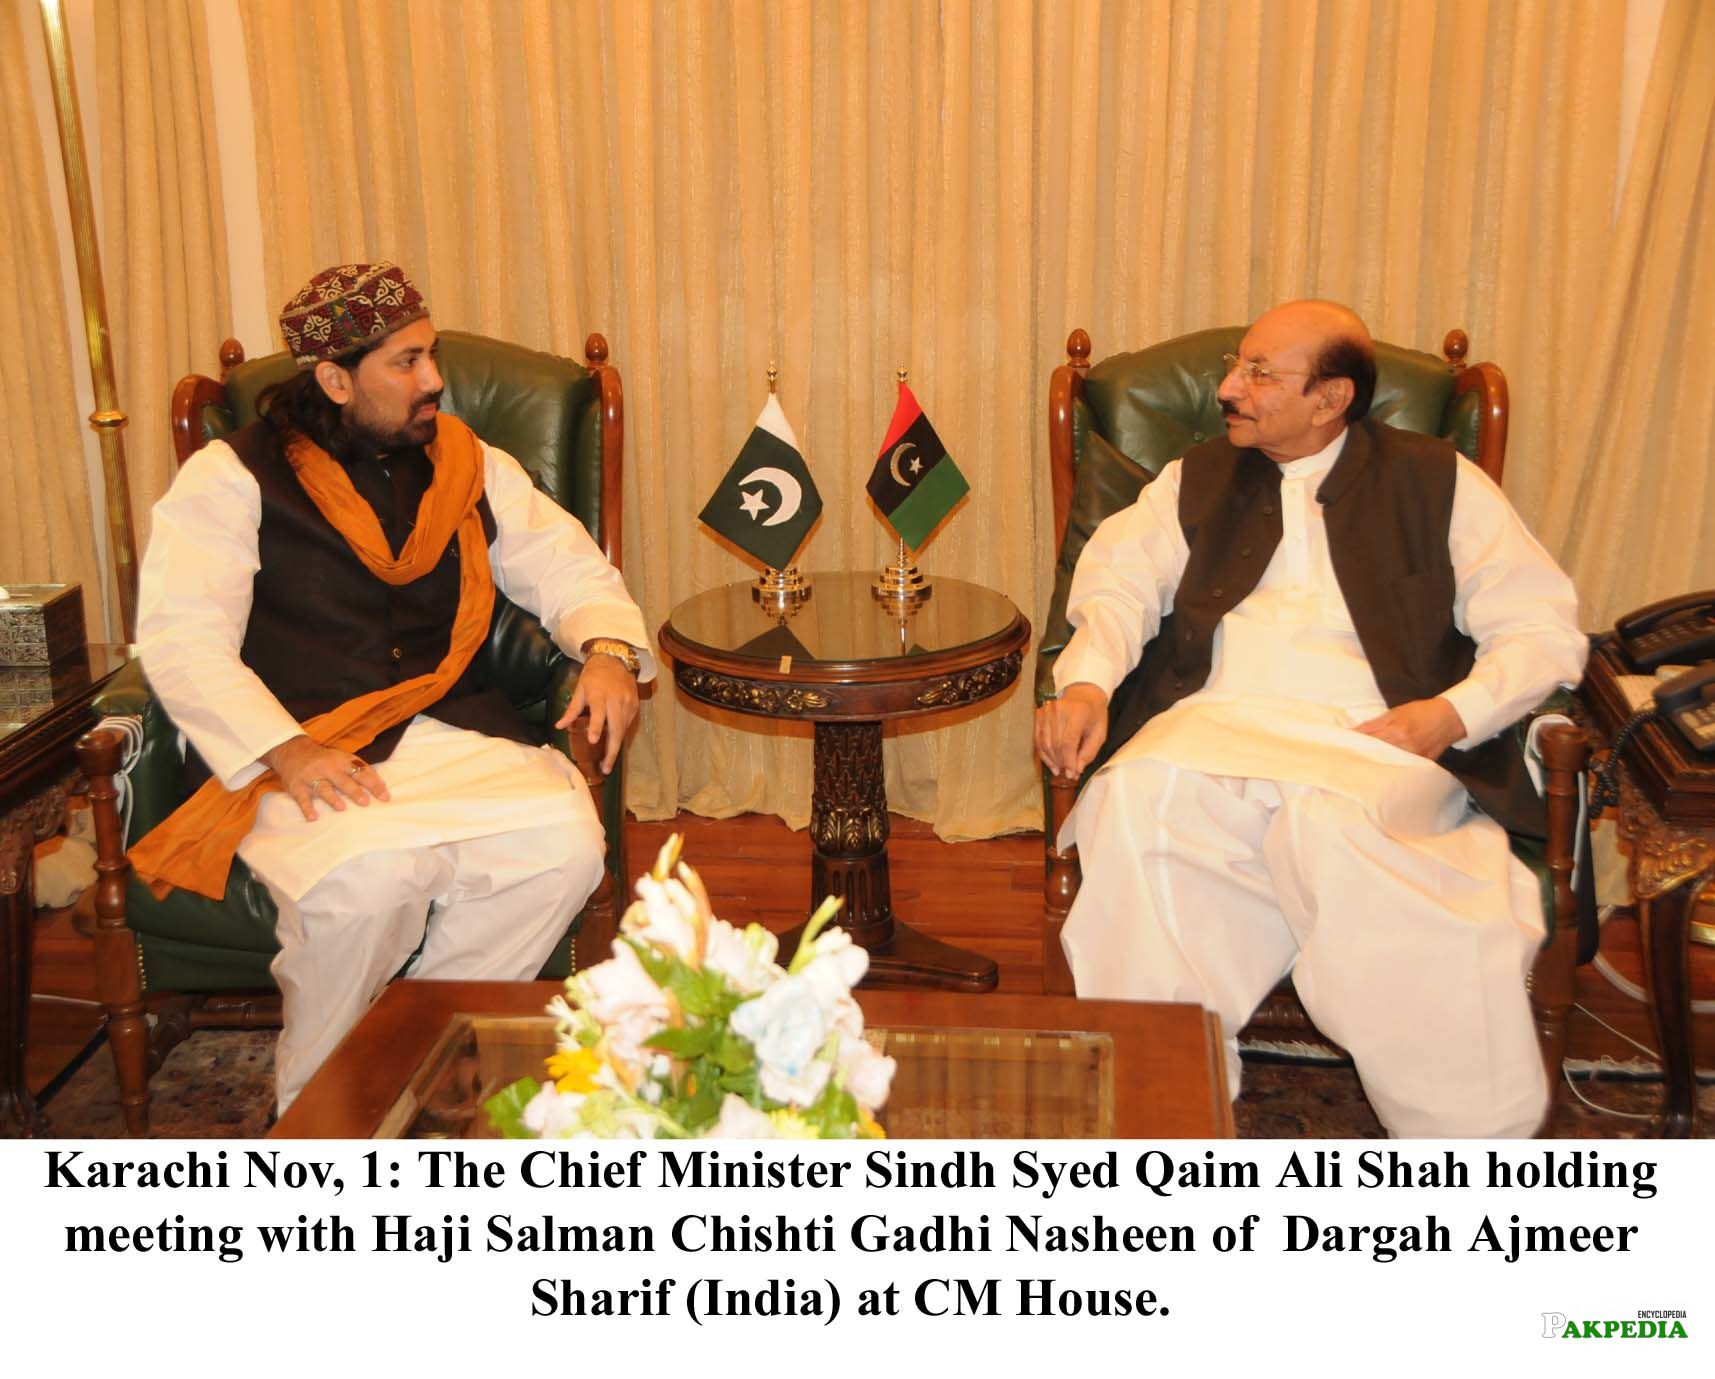 With Haji Salman Chishti